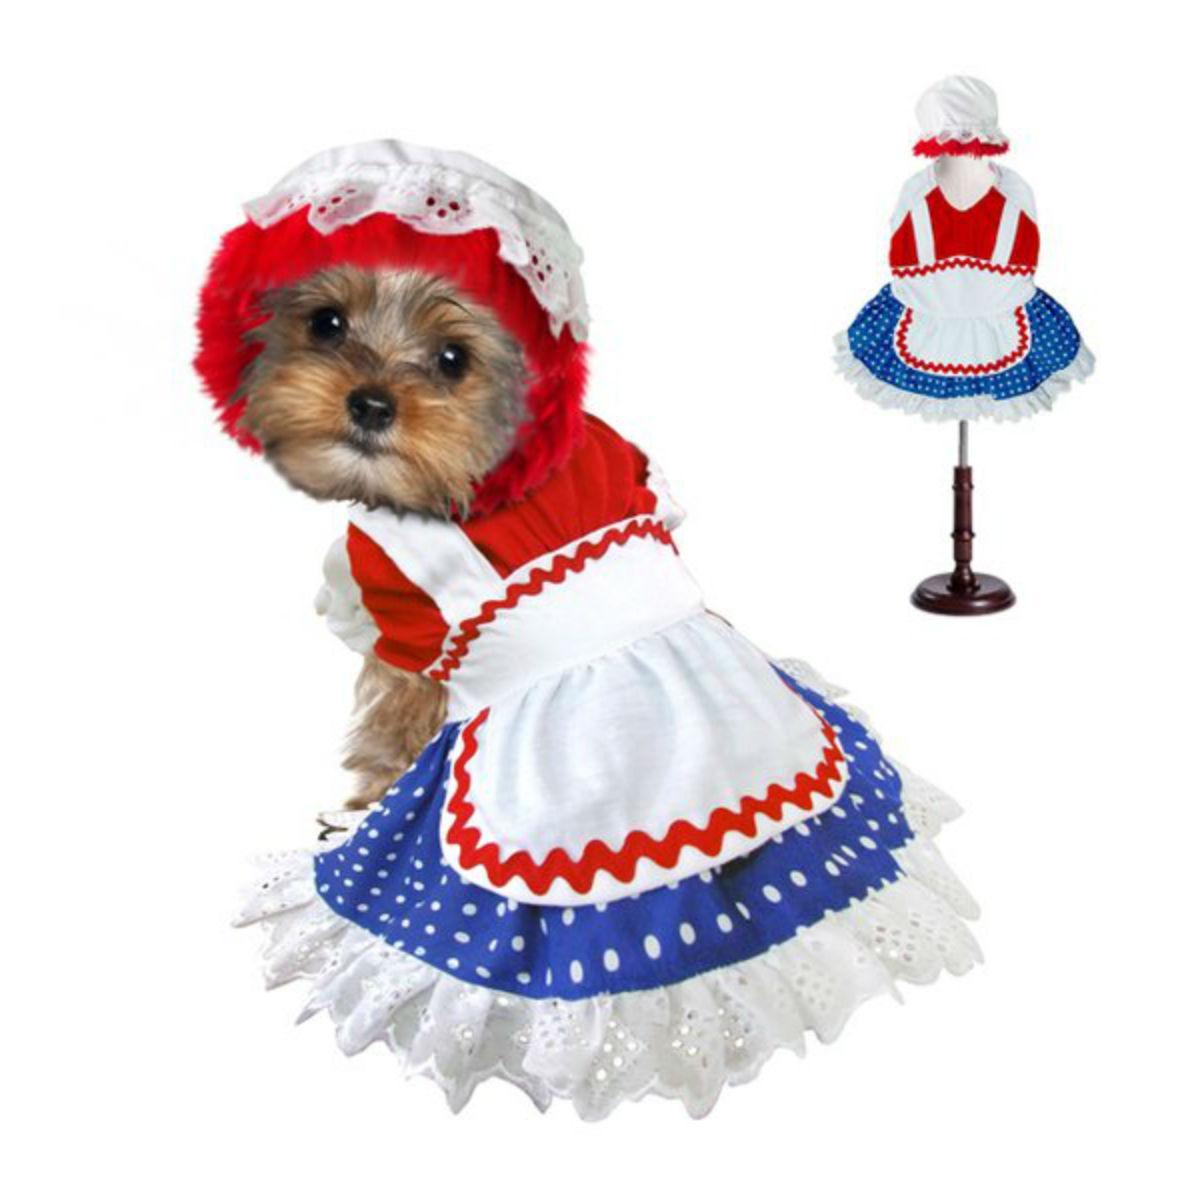 Ragdoll Halloween Dog Costume - Girl